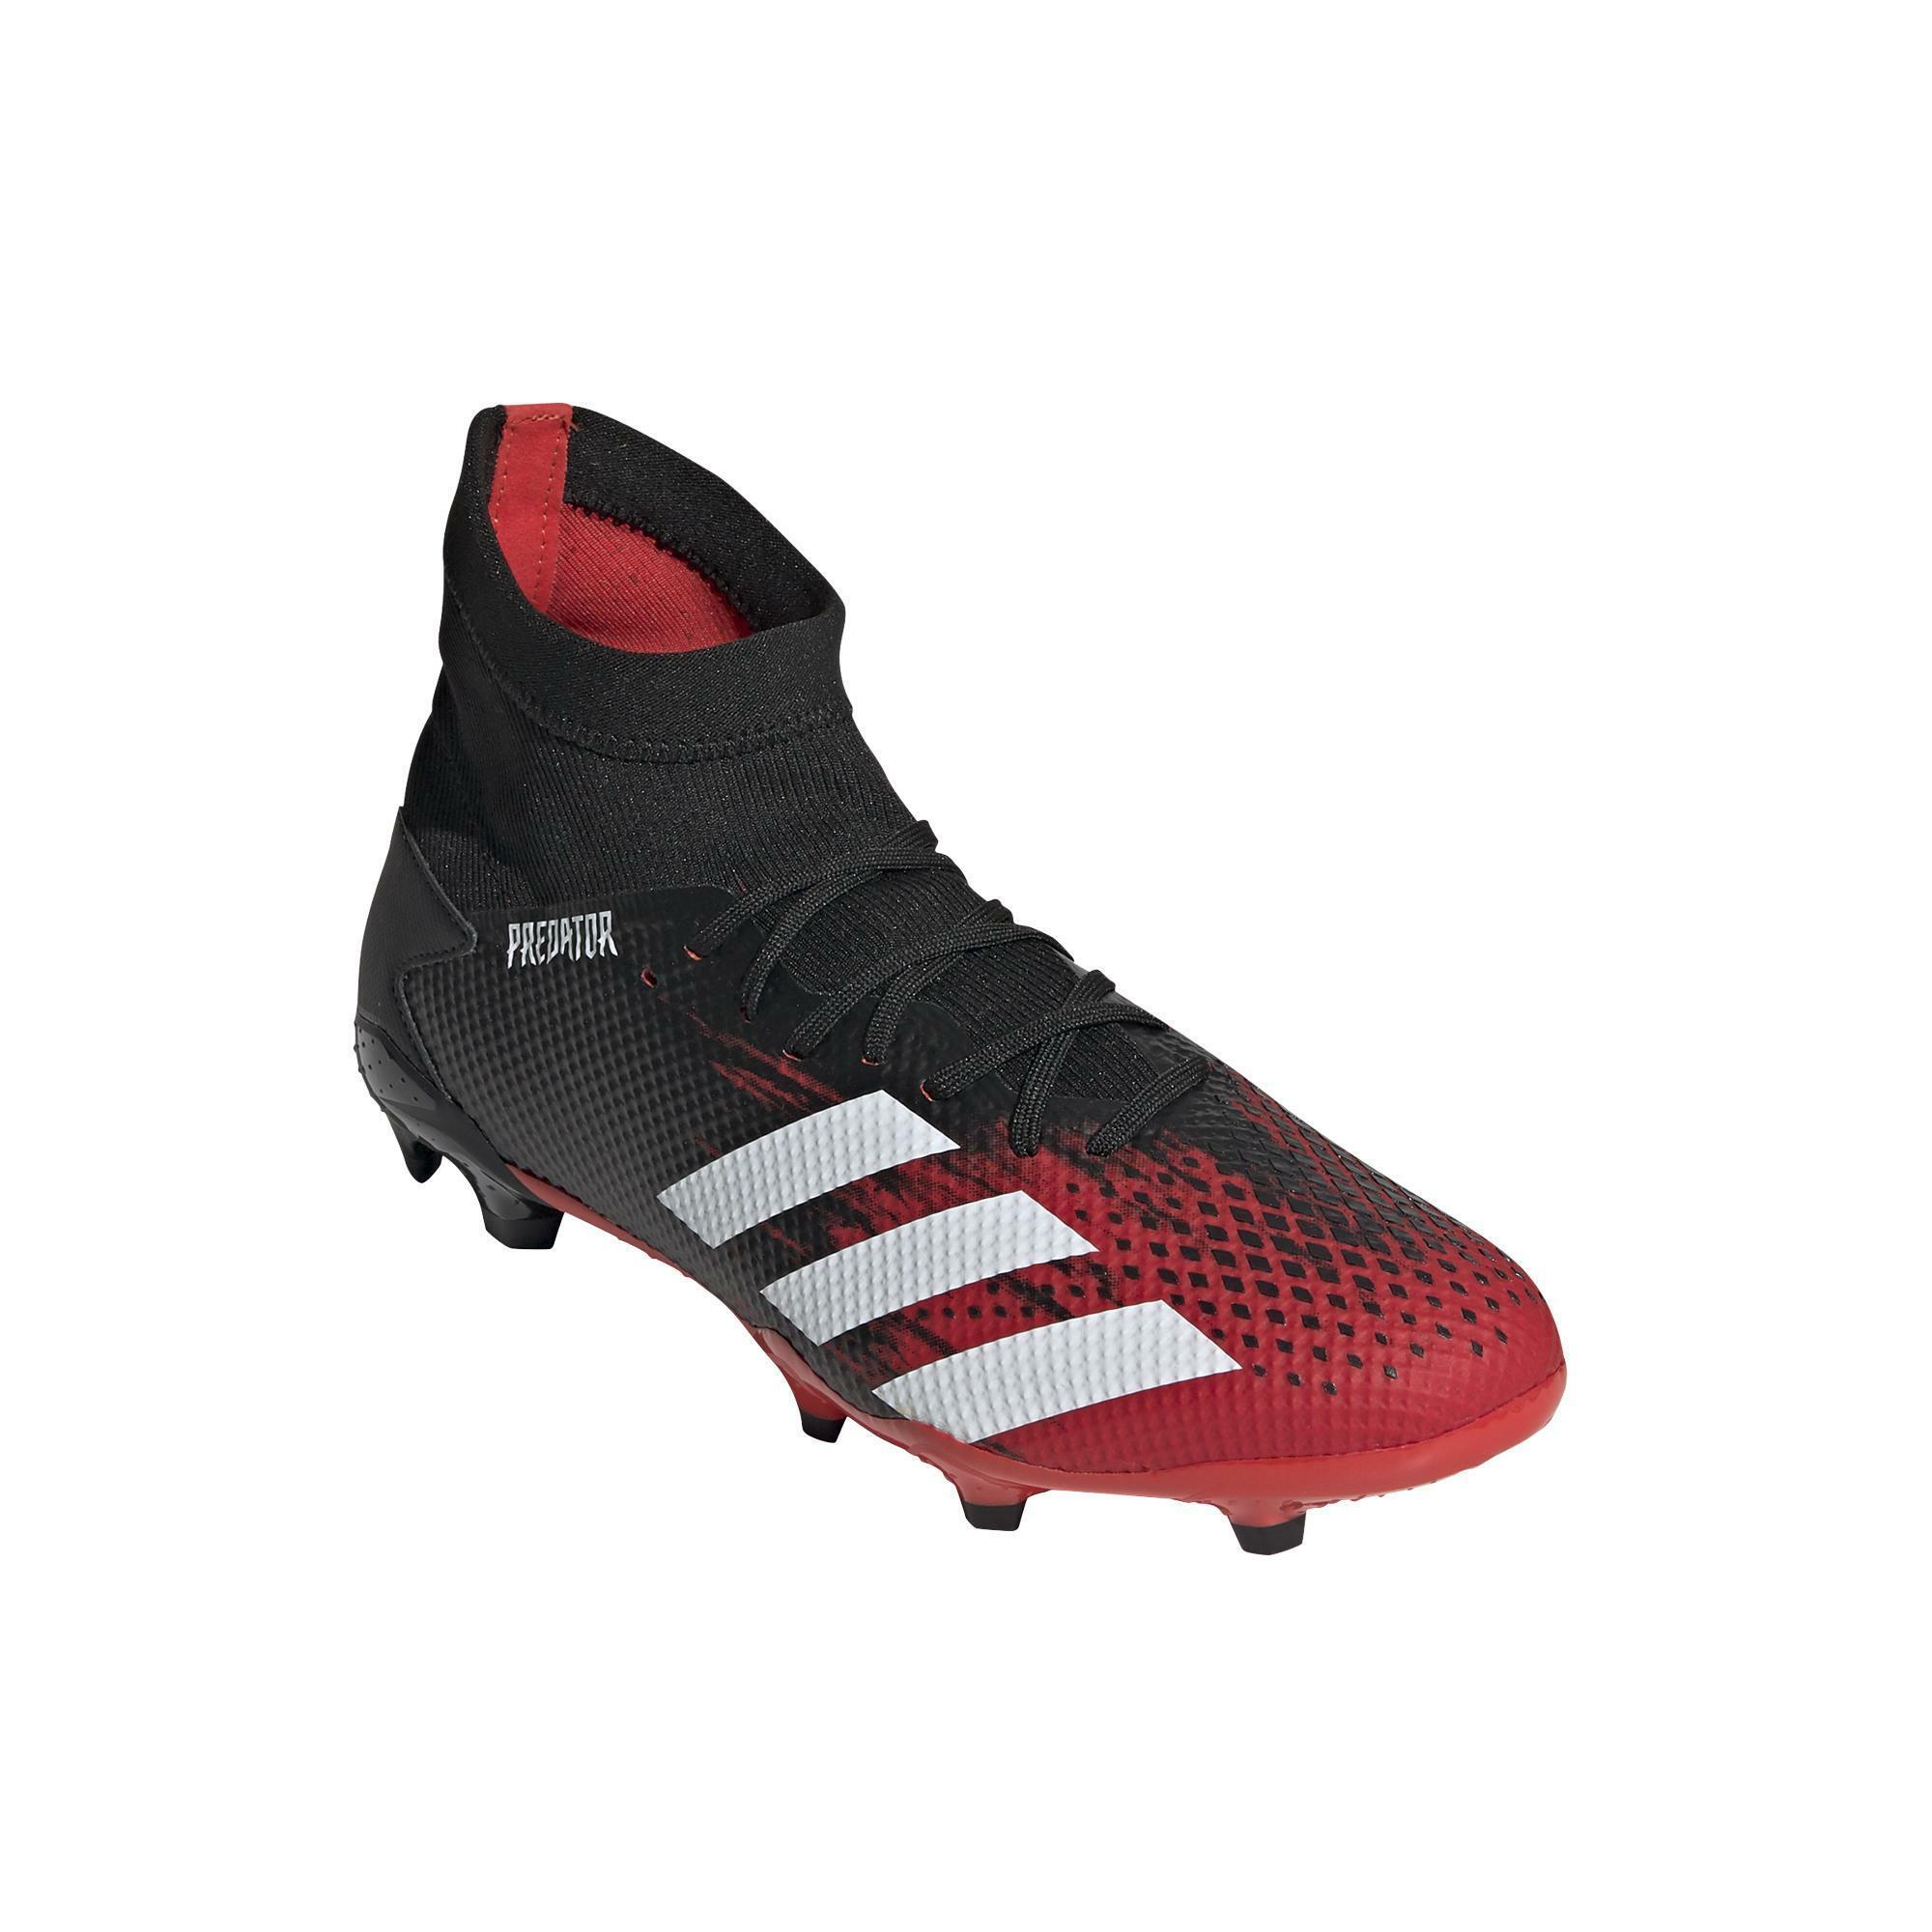 adidas adidas scarpa calcio predator 20.3 fg